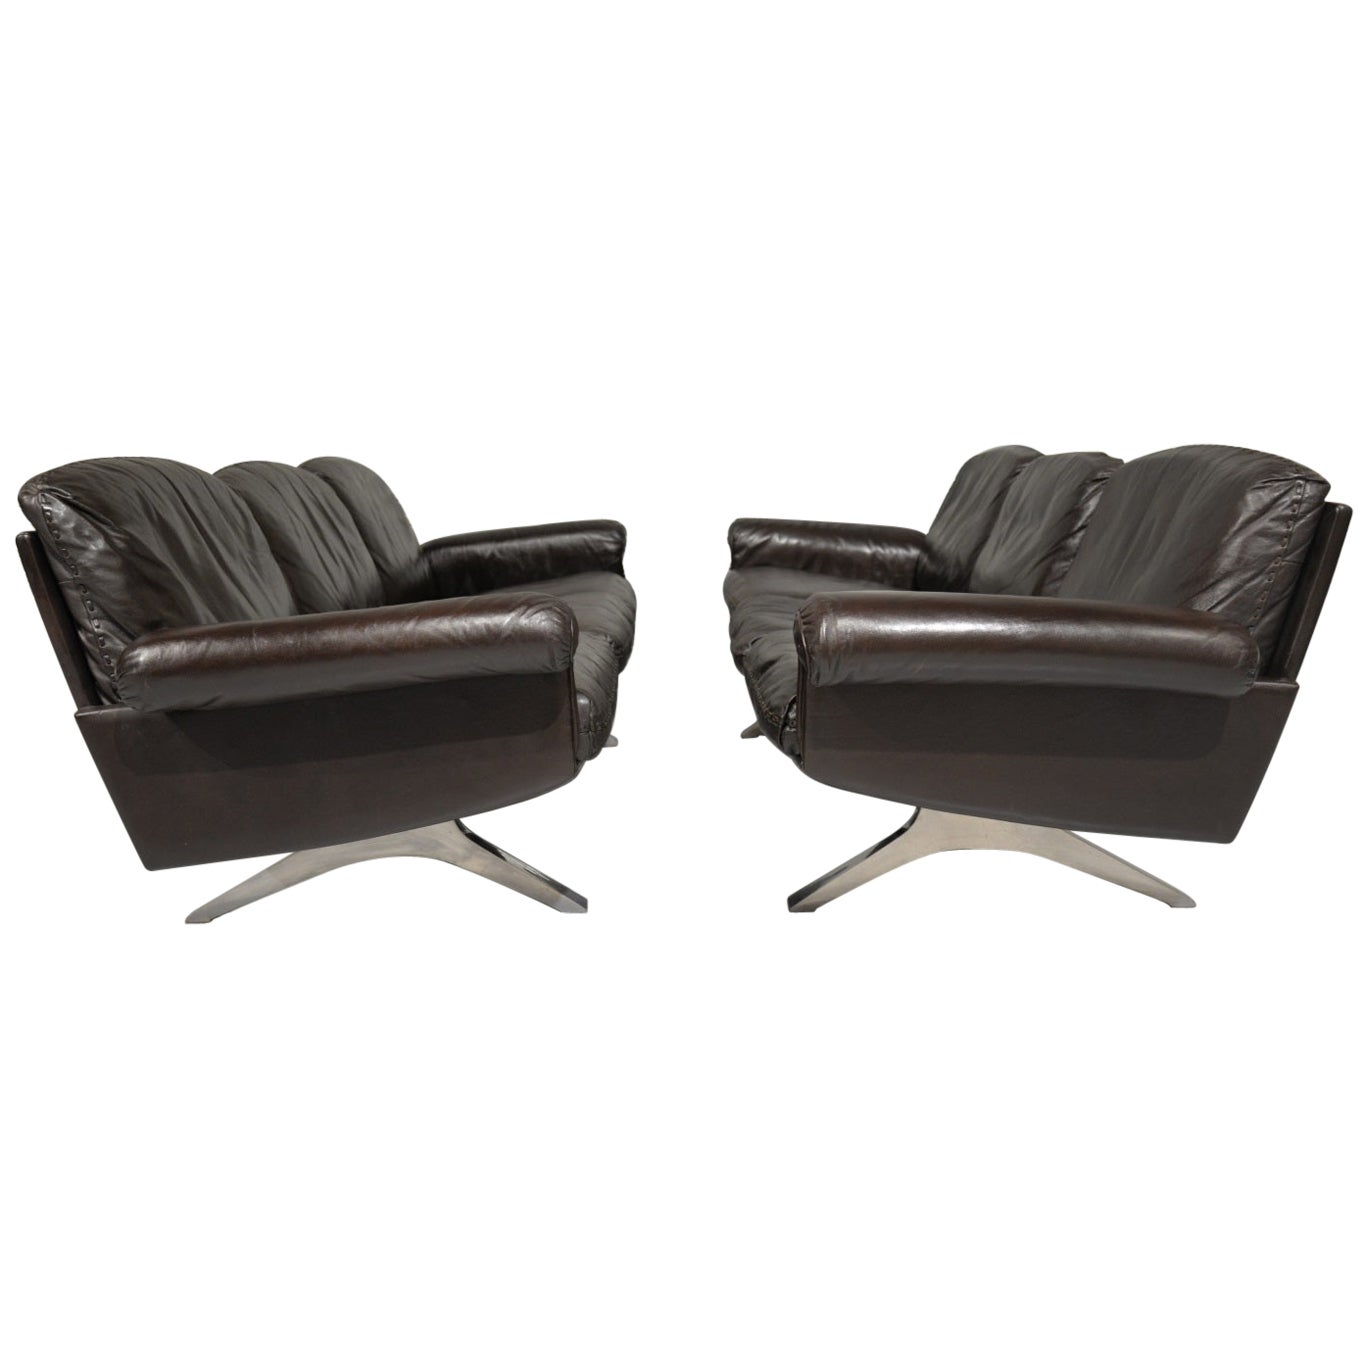 Vintage De Sede DS 31 Leather Three-Seat Sofas, Switzerland 1970s